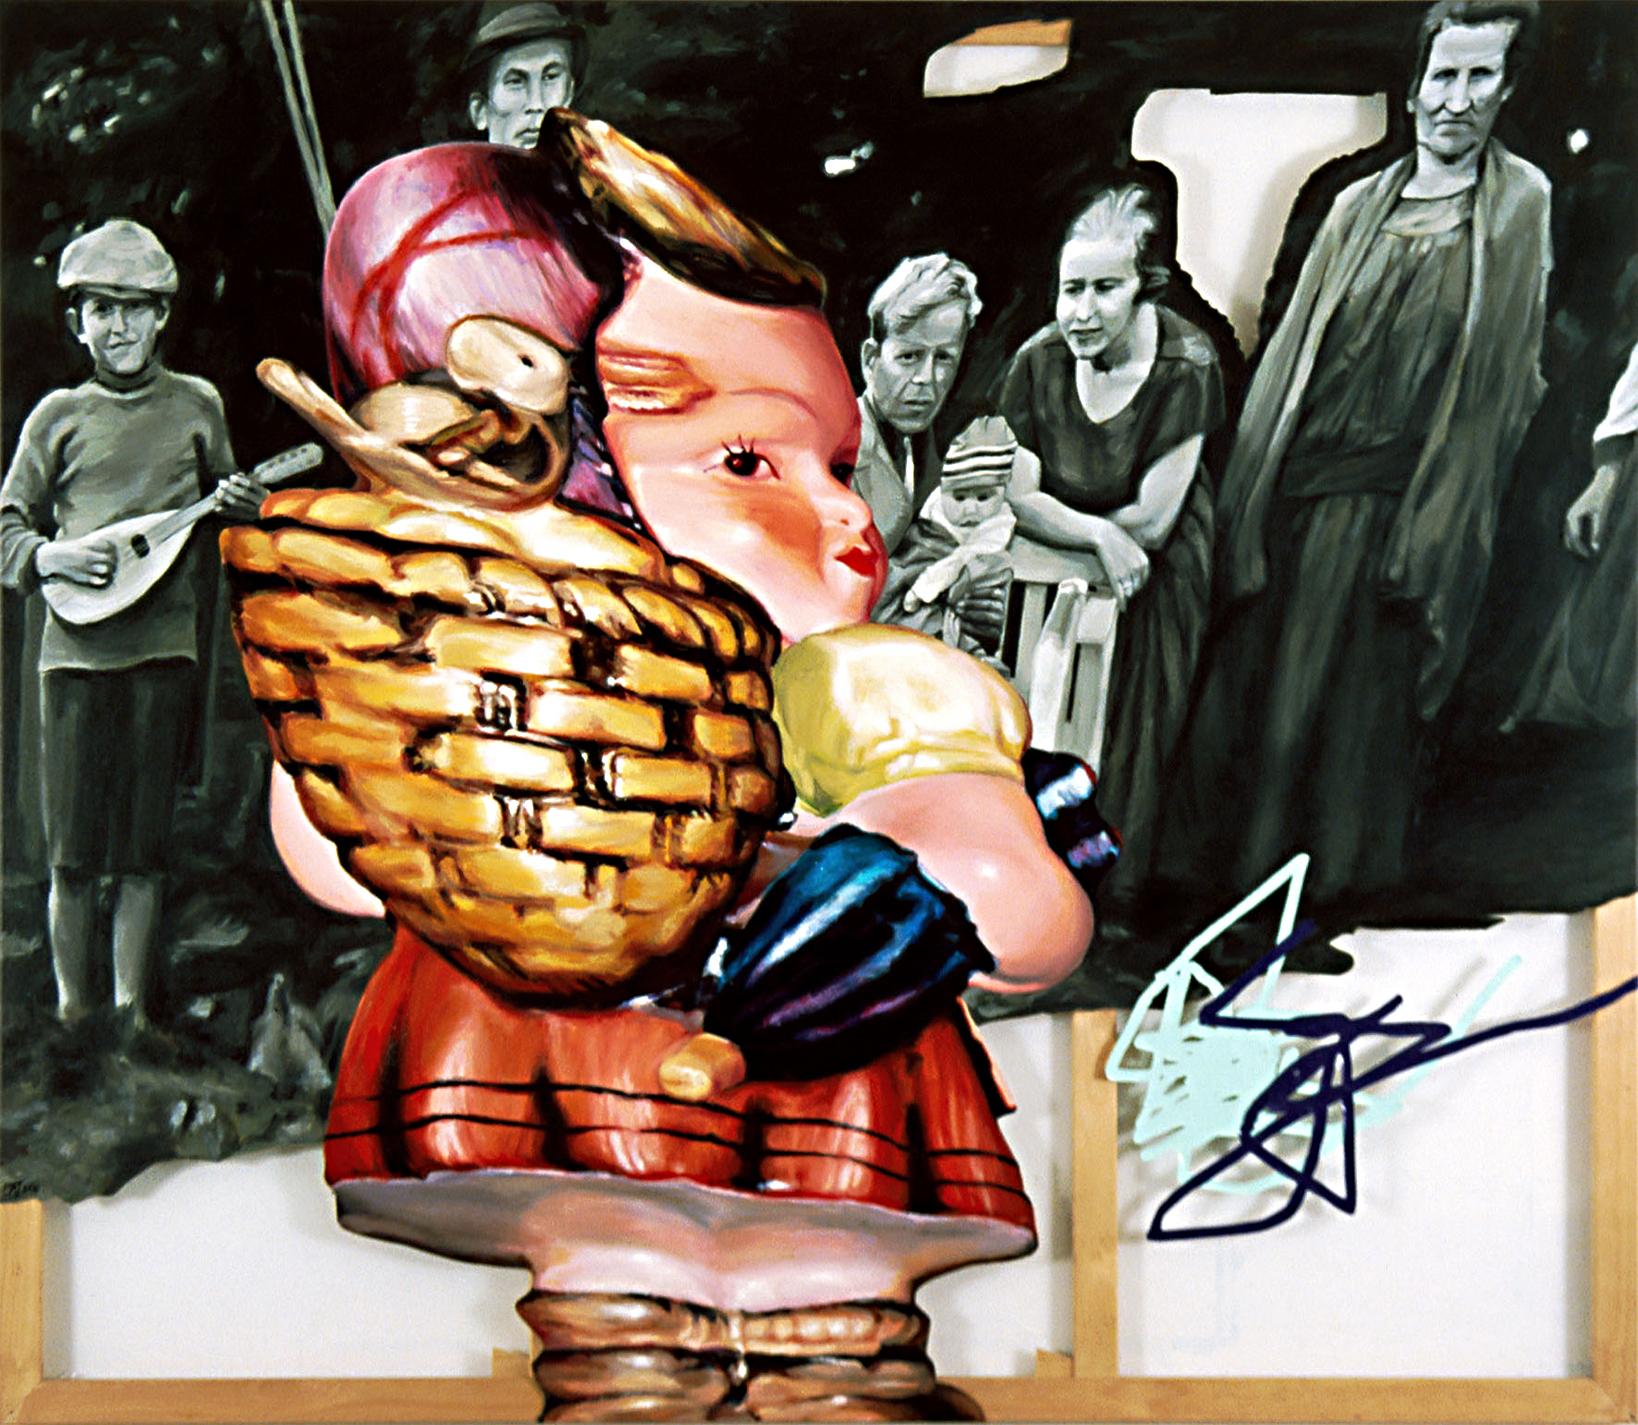 'Family Scene 3' 213 x 243cm, oil on canvas, plastic (Faulting Collection, Australia)